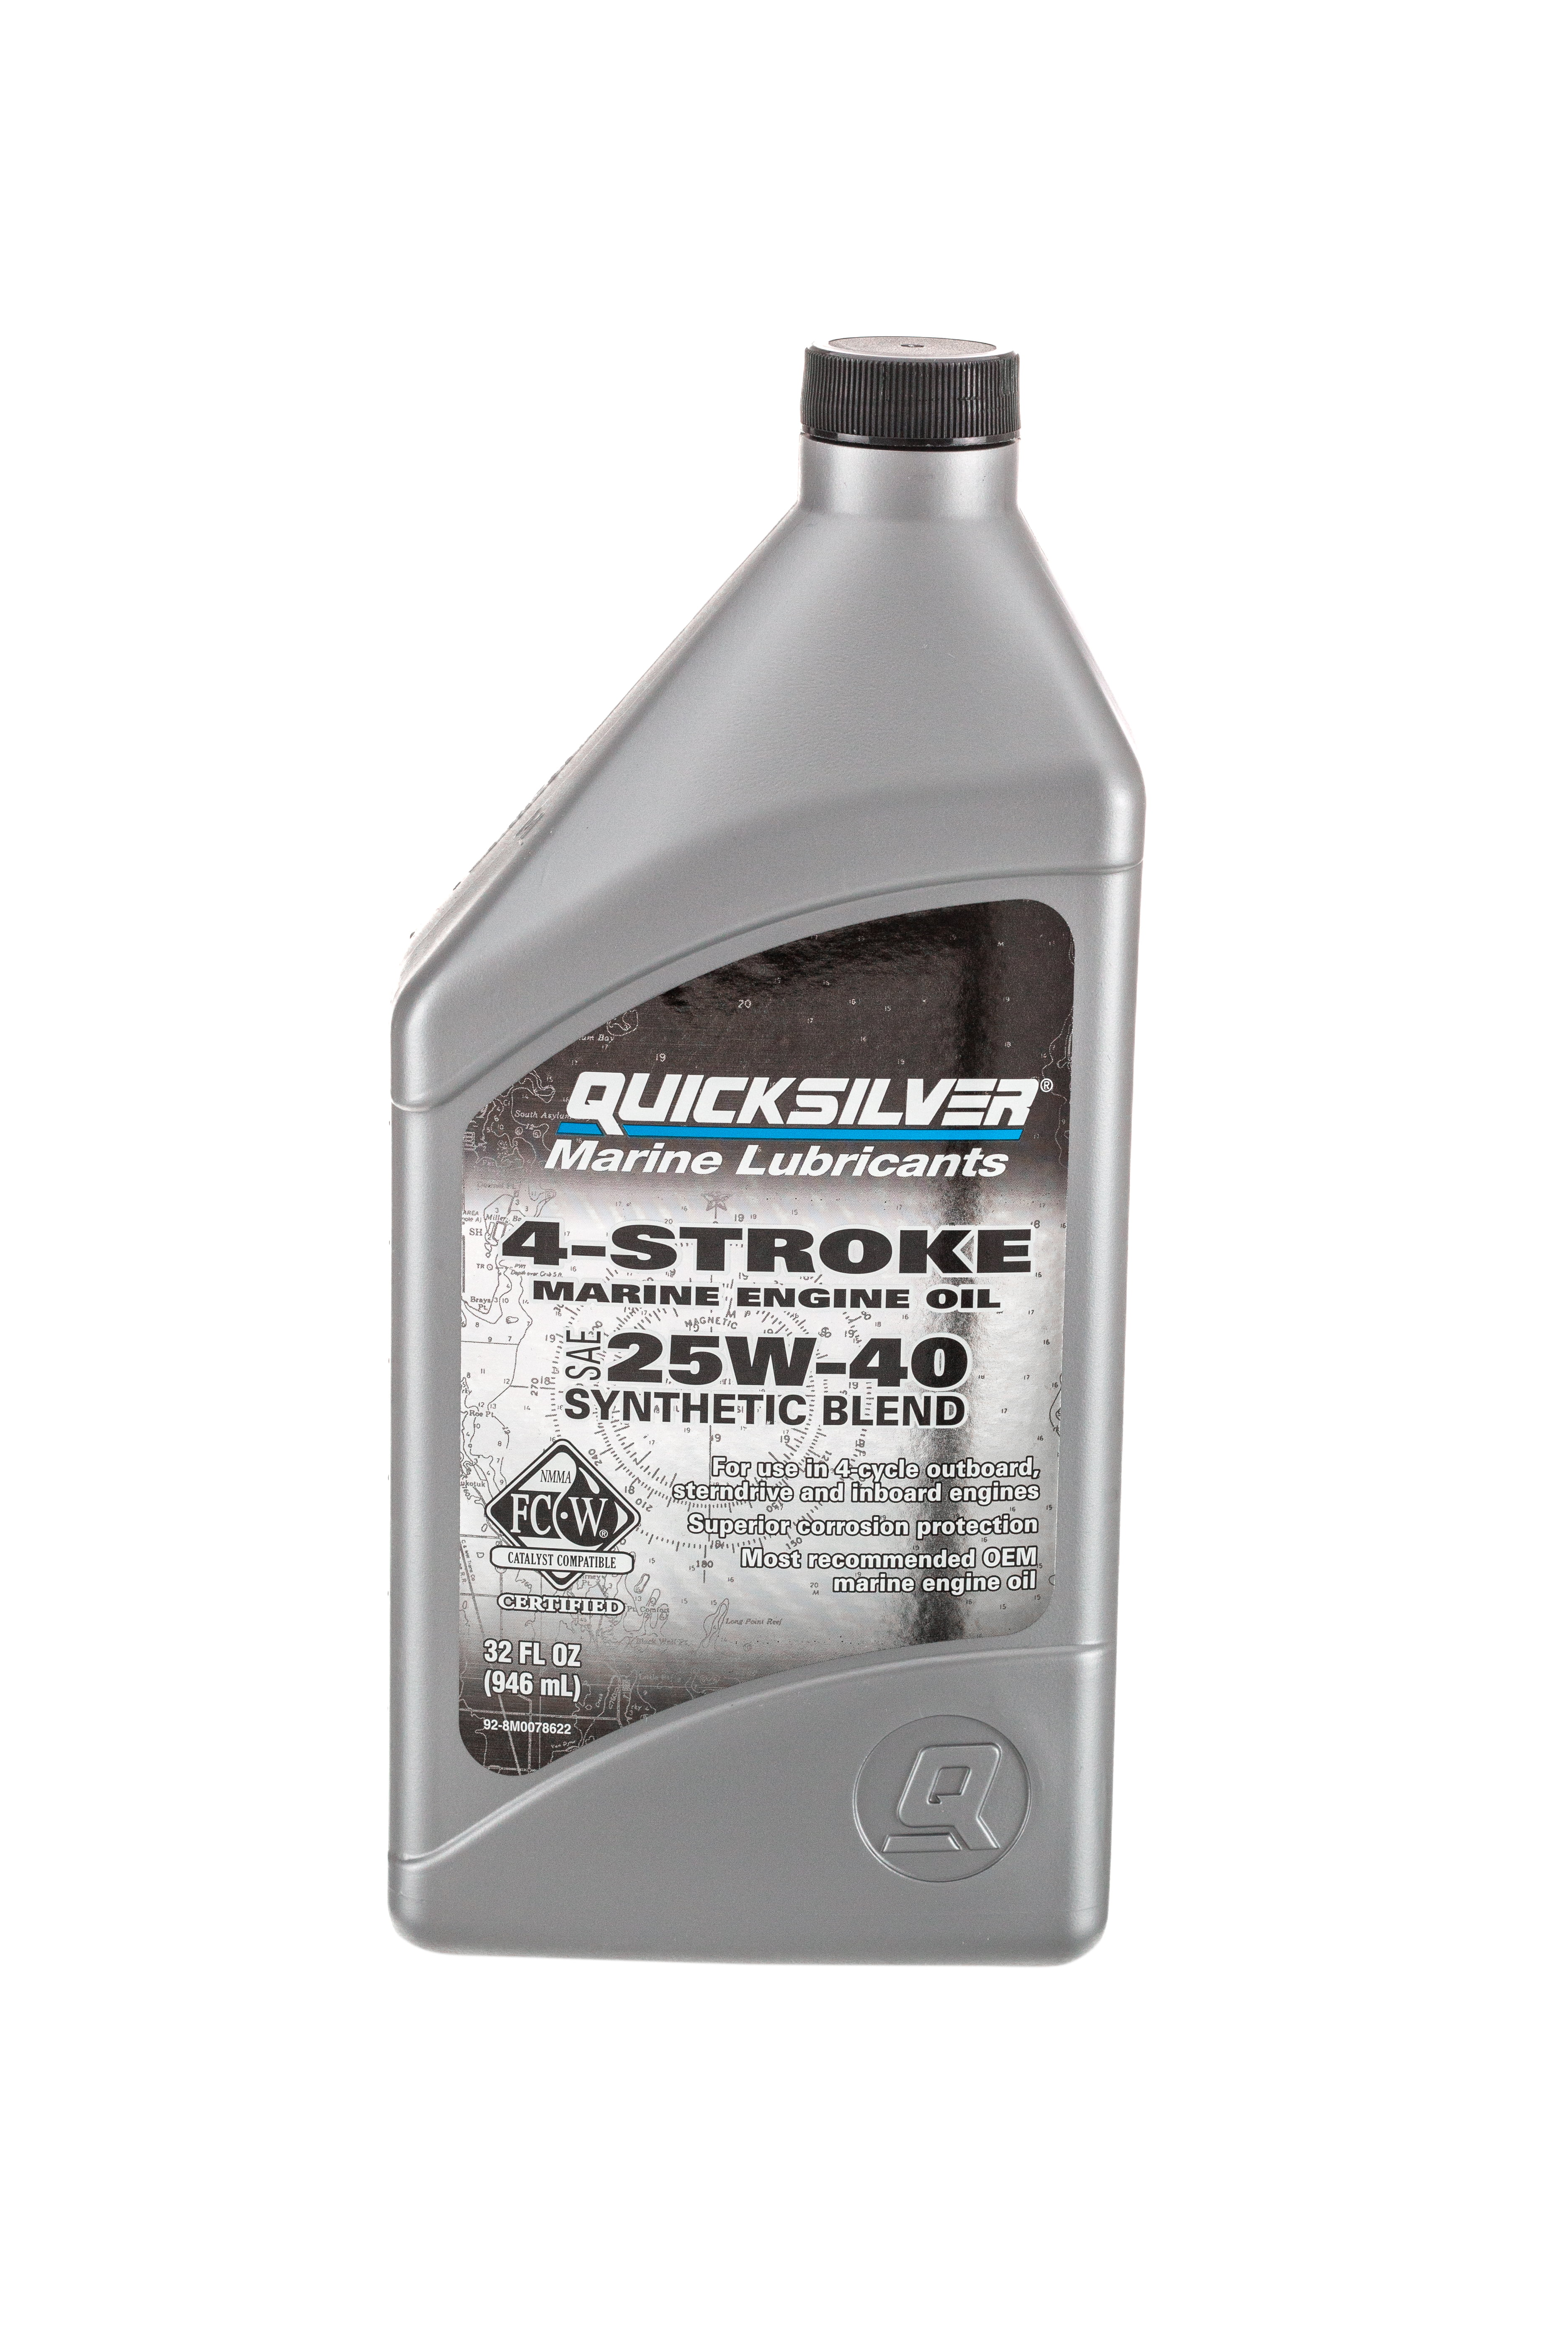 Quicksilver 8M0078622 4-Stroke Marine Engine Oil – For Outboard